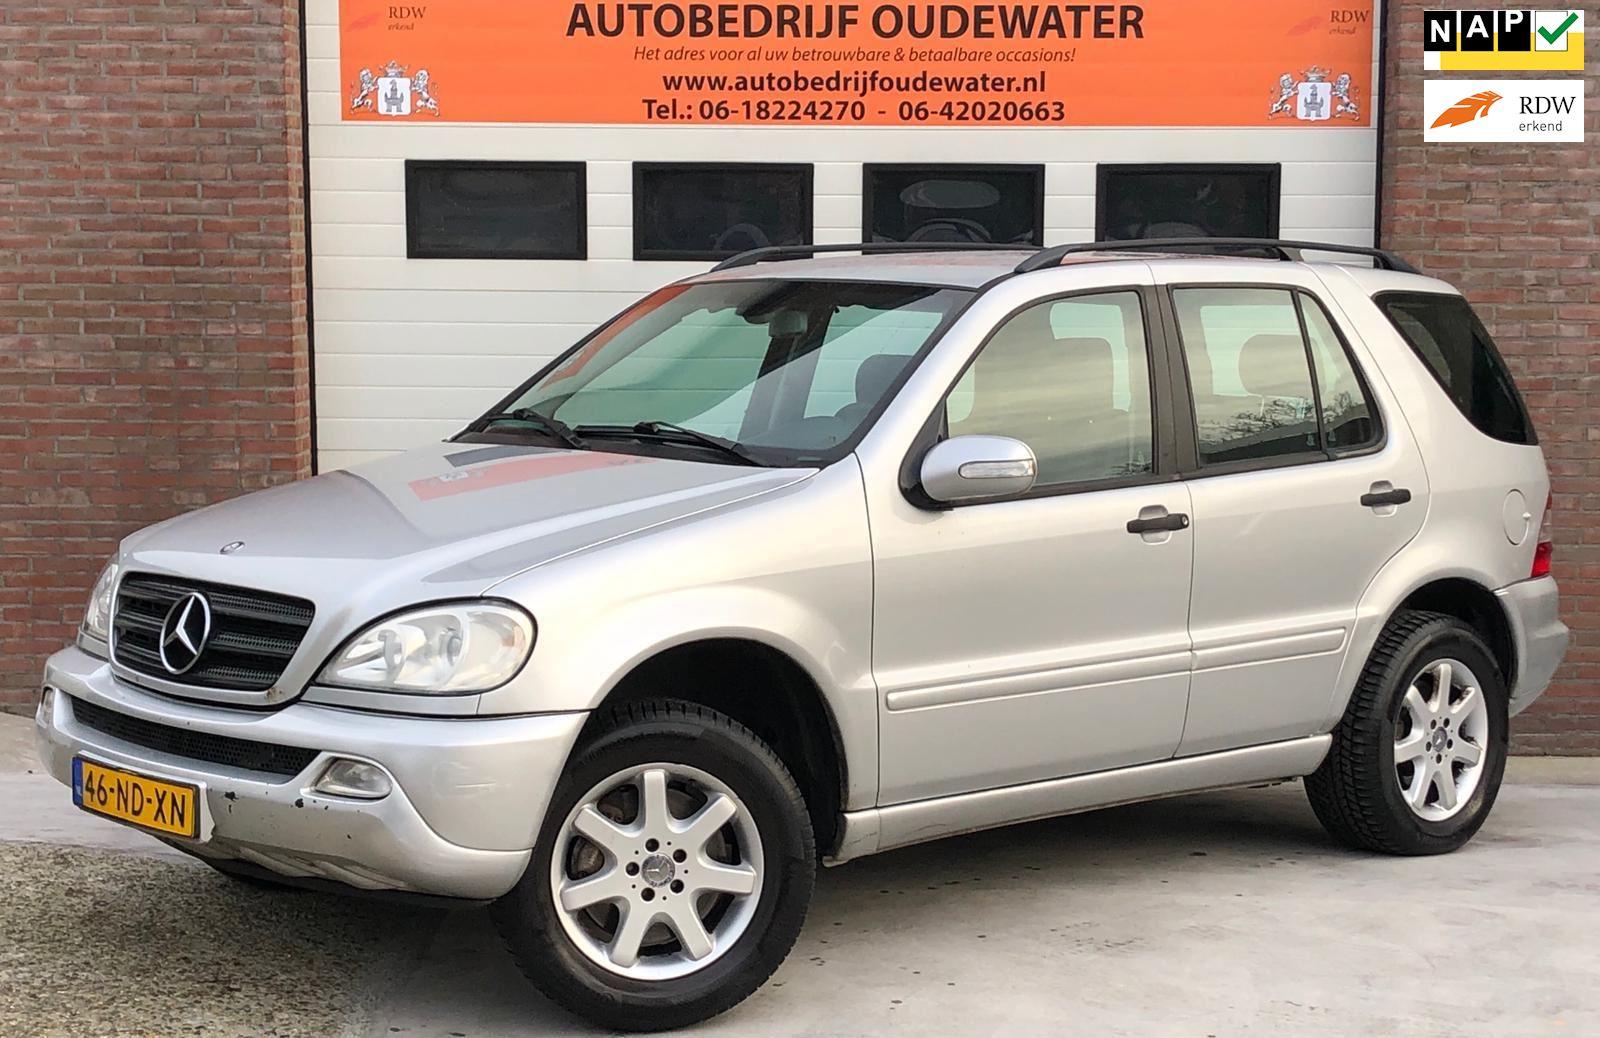 Mercedes-Benz ML occasion - Autobedrijf Oudewater